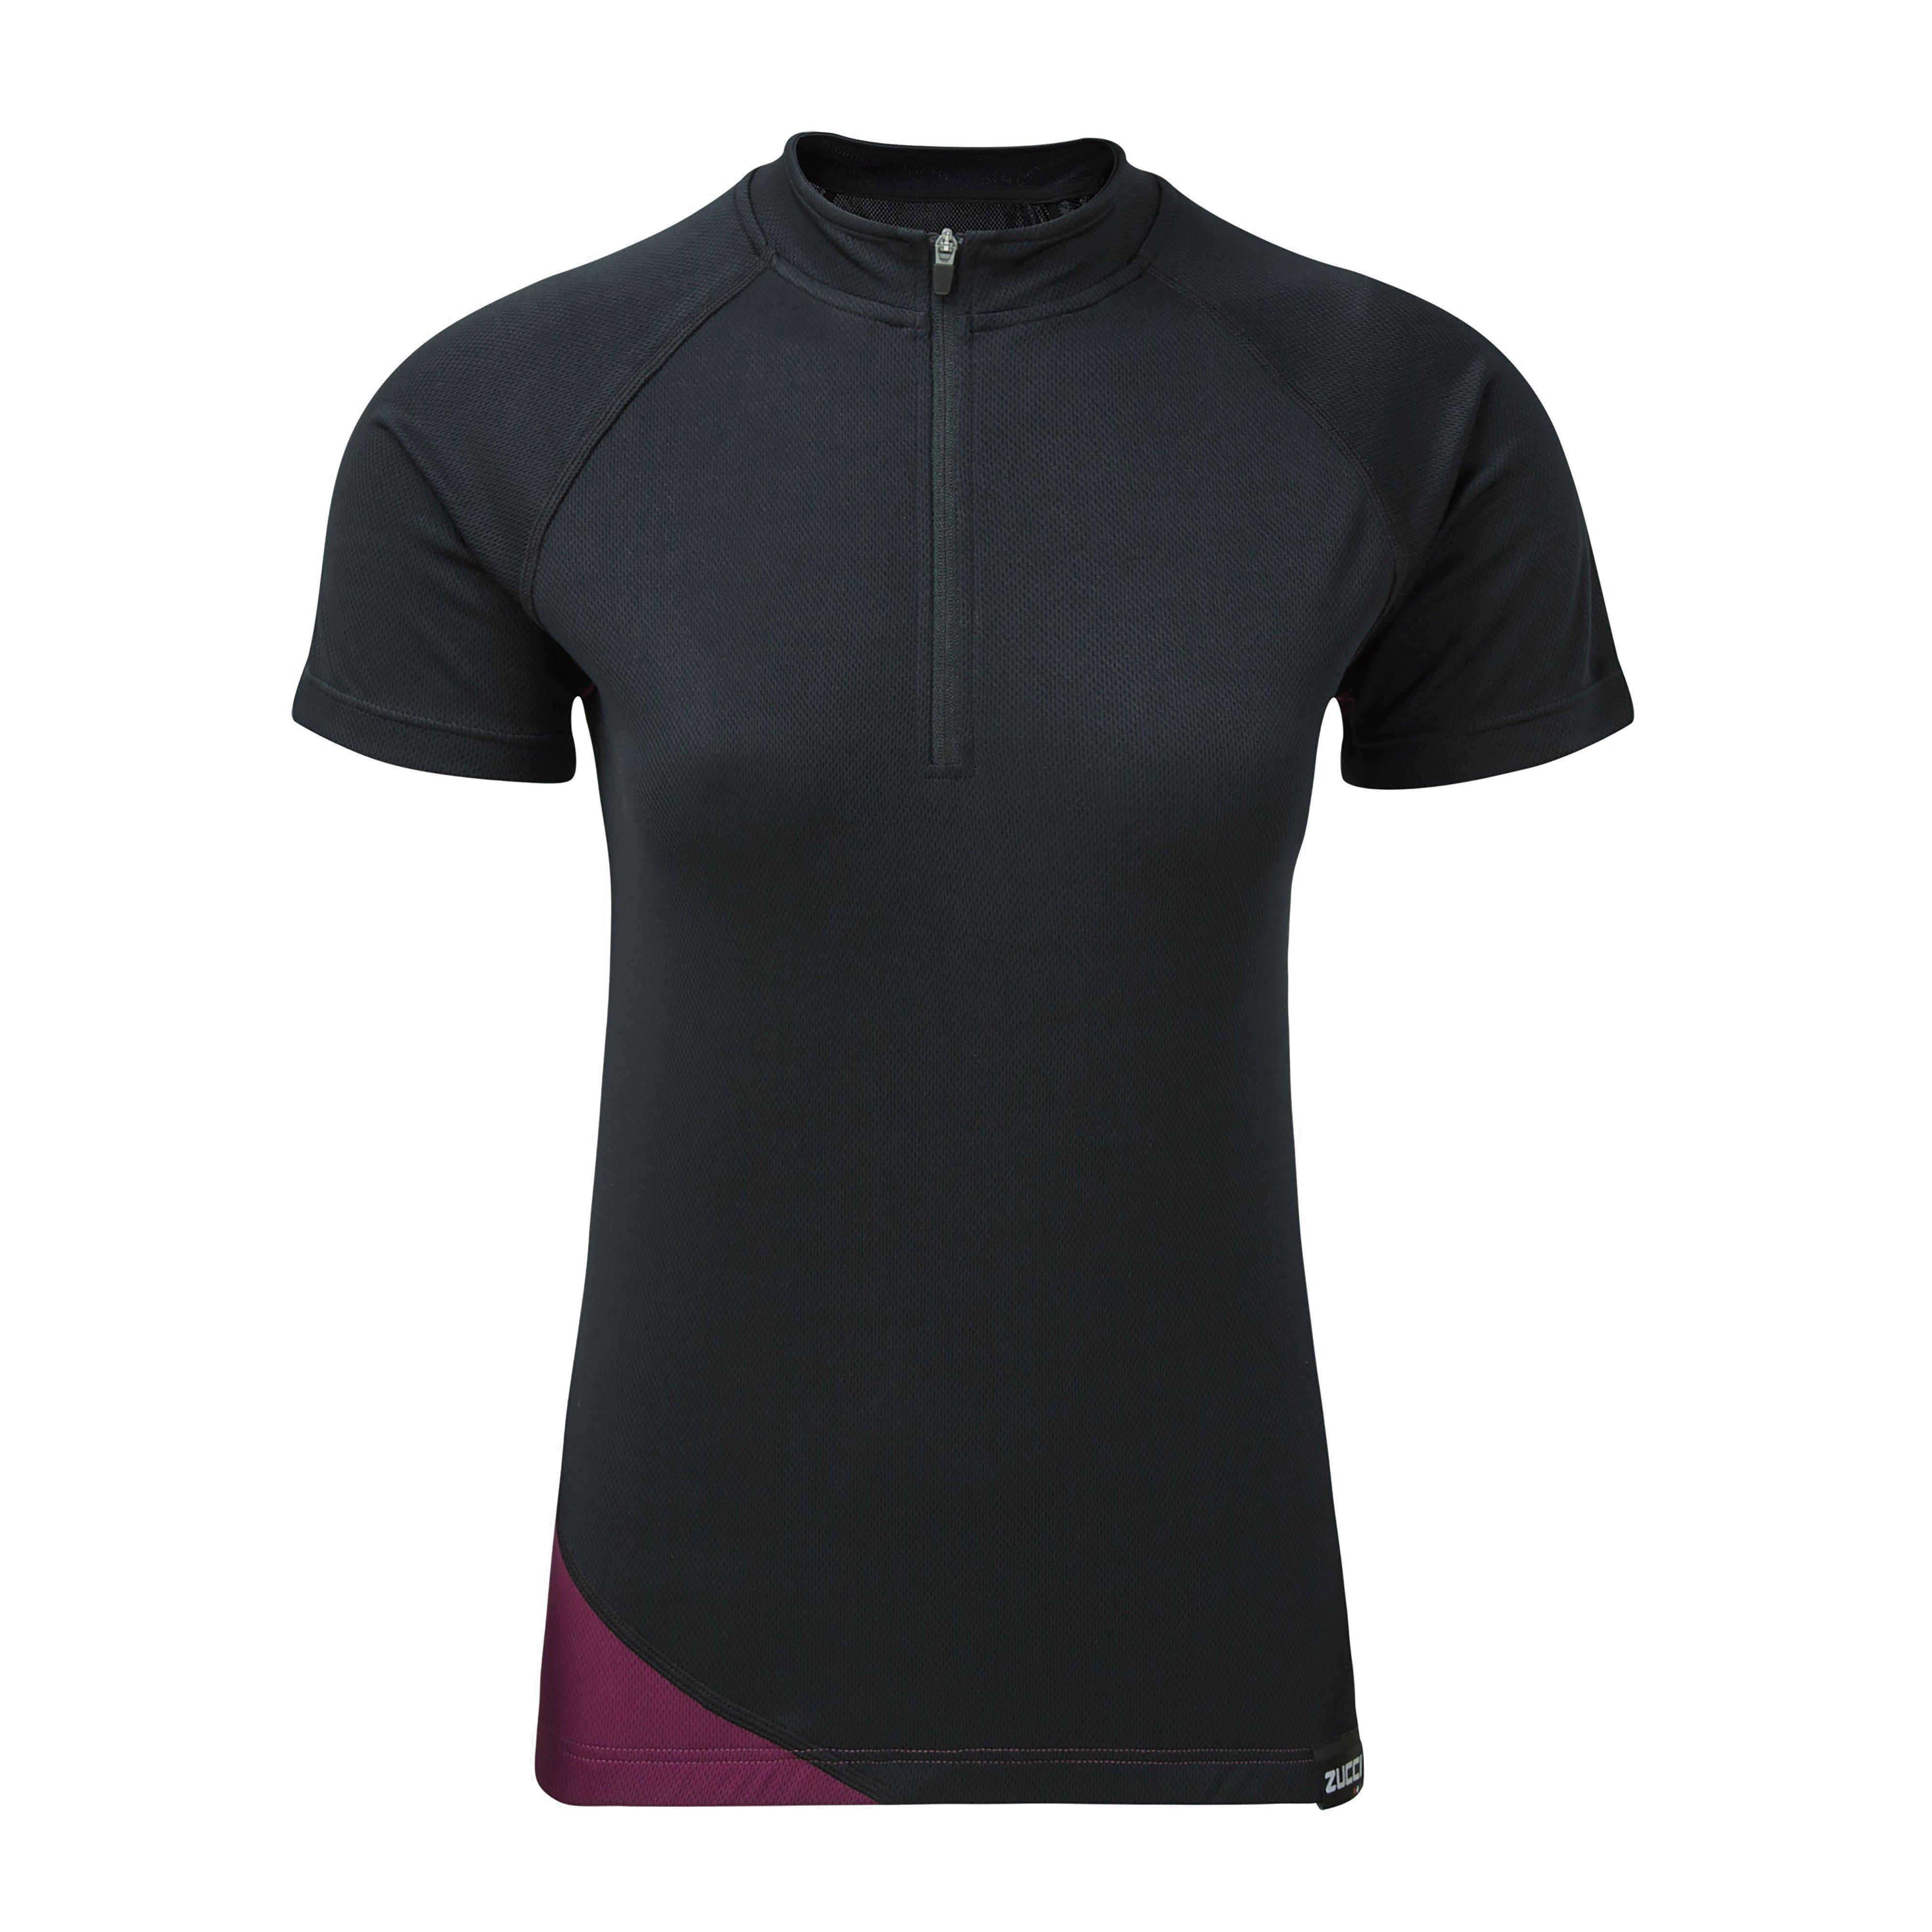 Zucci Zucci Comp Half-Zip Short Sleeve Womens Jersey